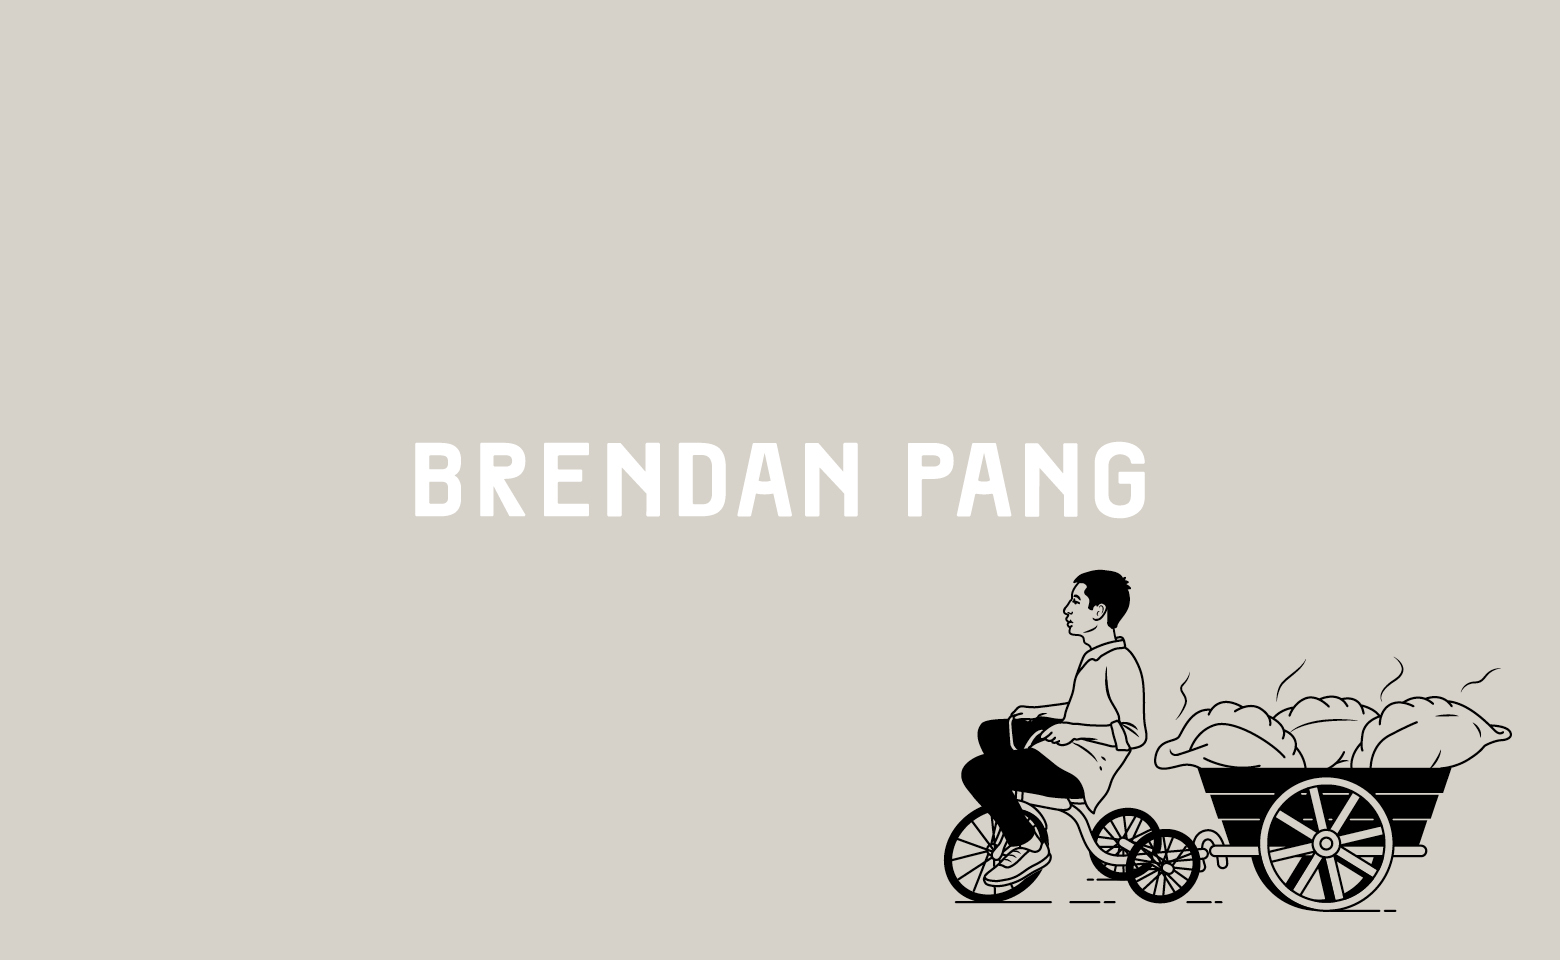 RyanVincent_Web_BrendanPang